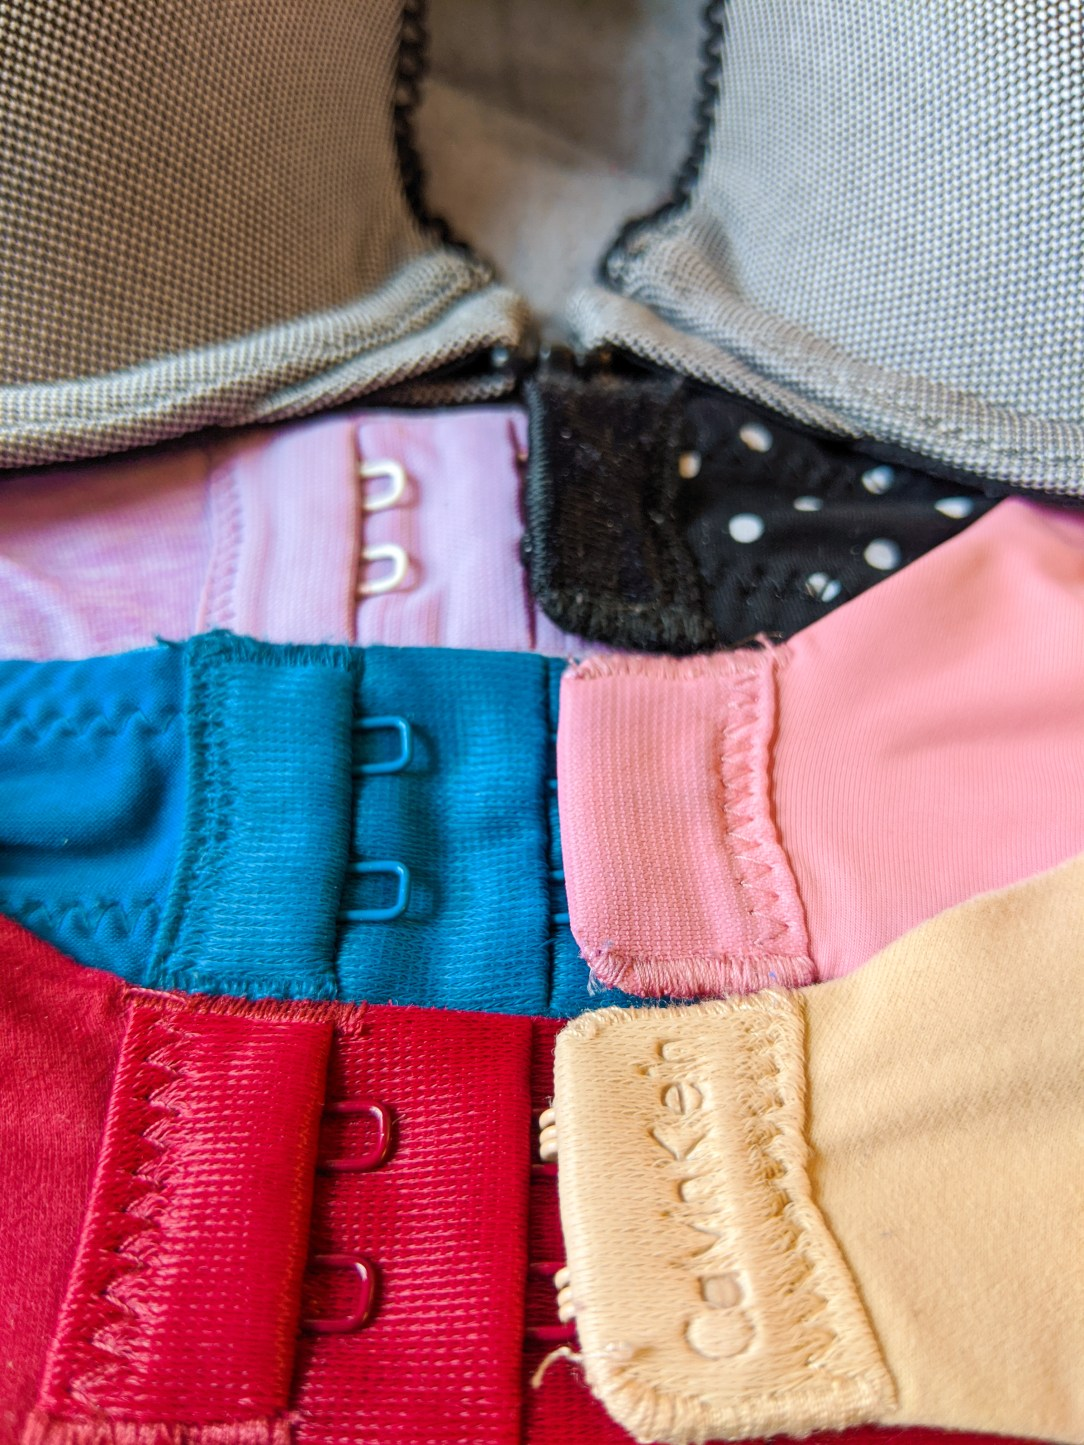 bra clasps, bra shopping, front clip bras